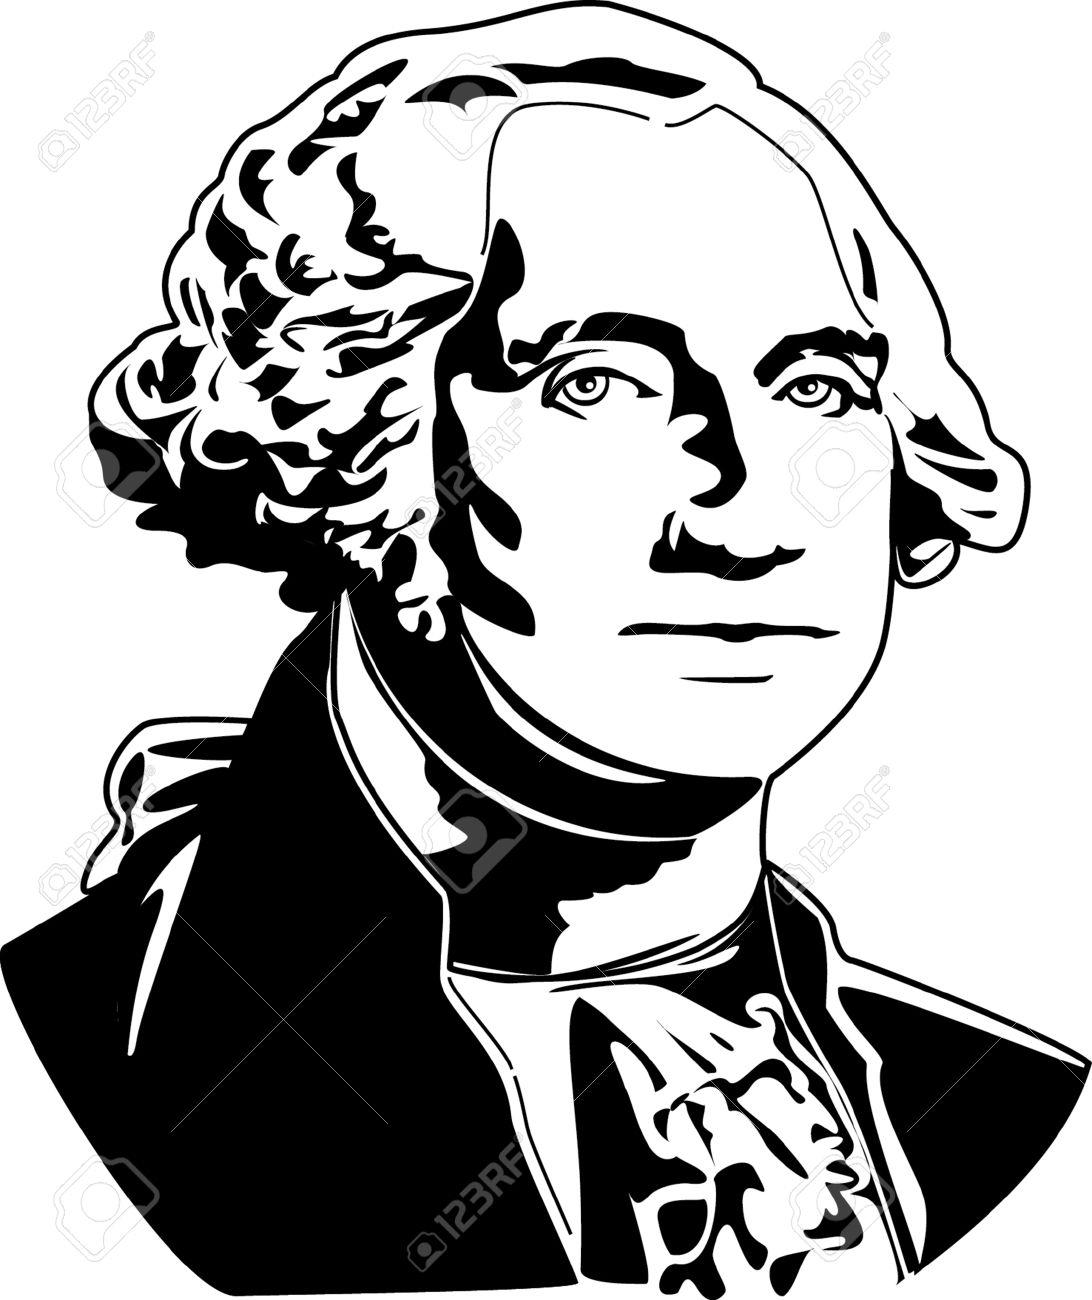 George Washington Silhouette Clipart 10 Free Cliparts